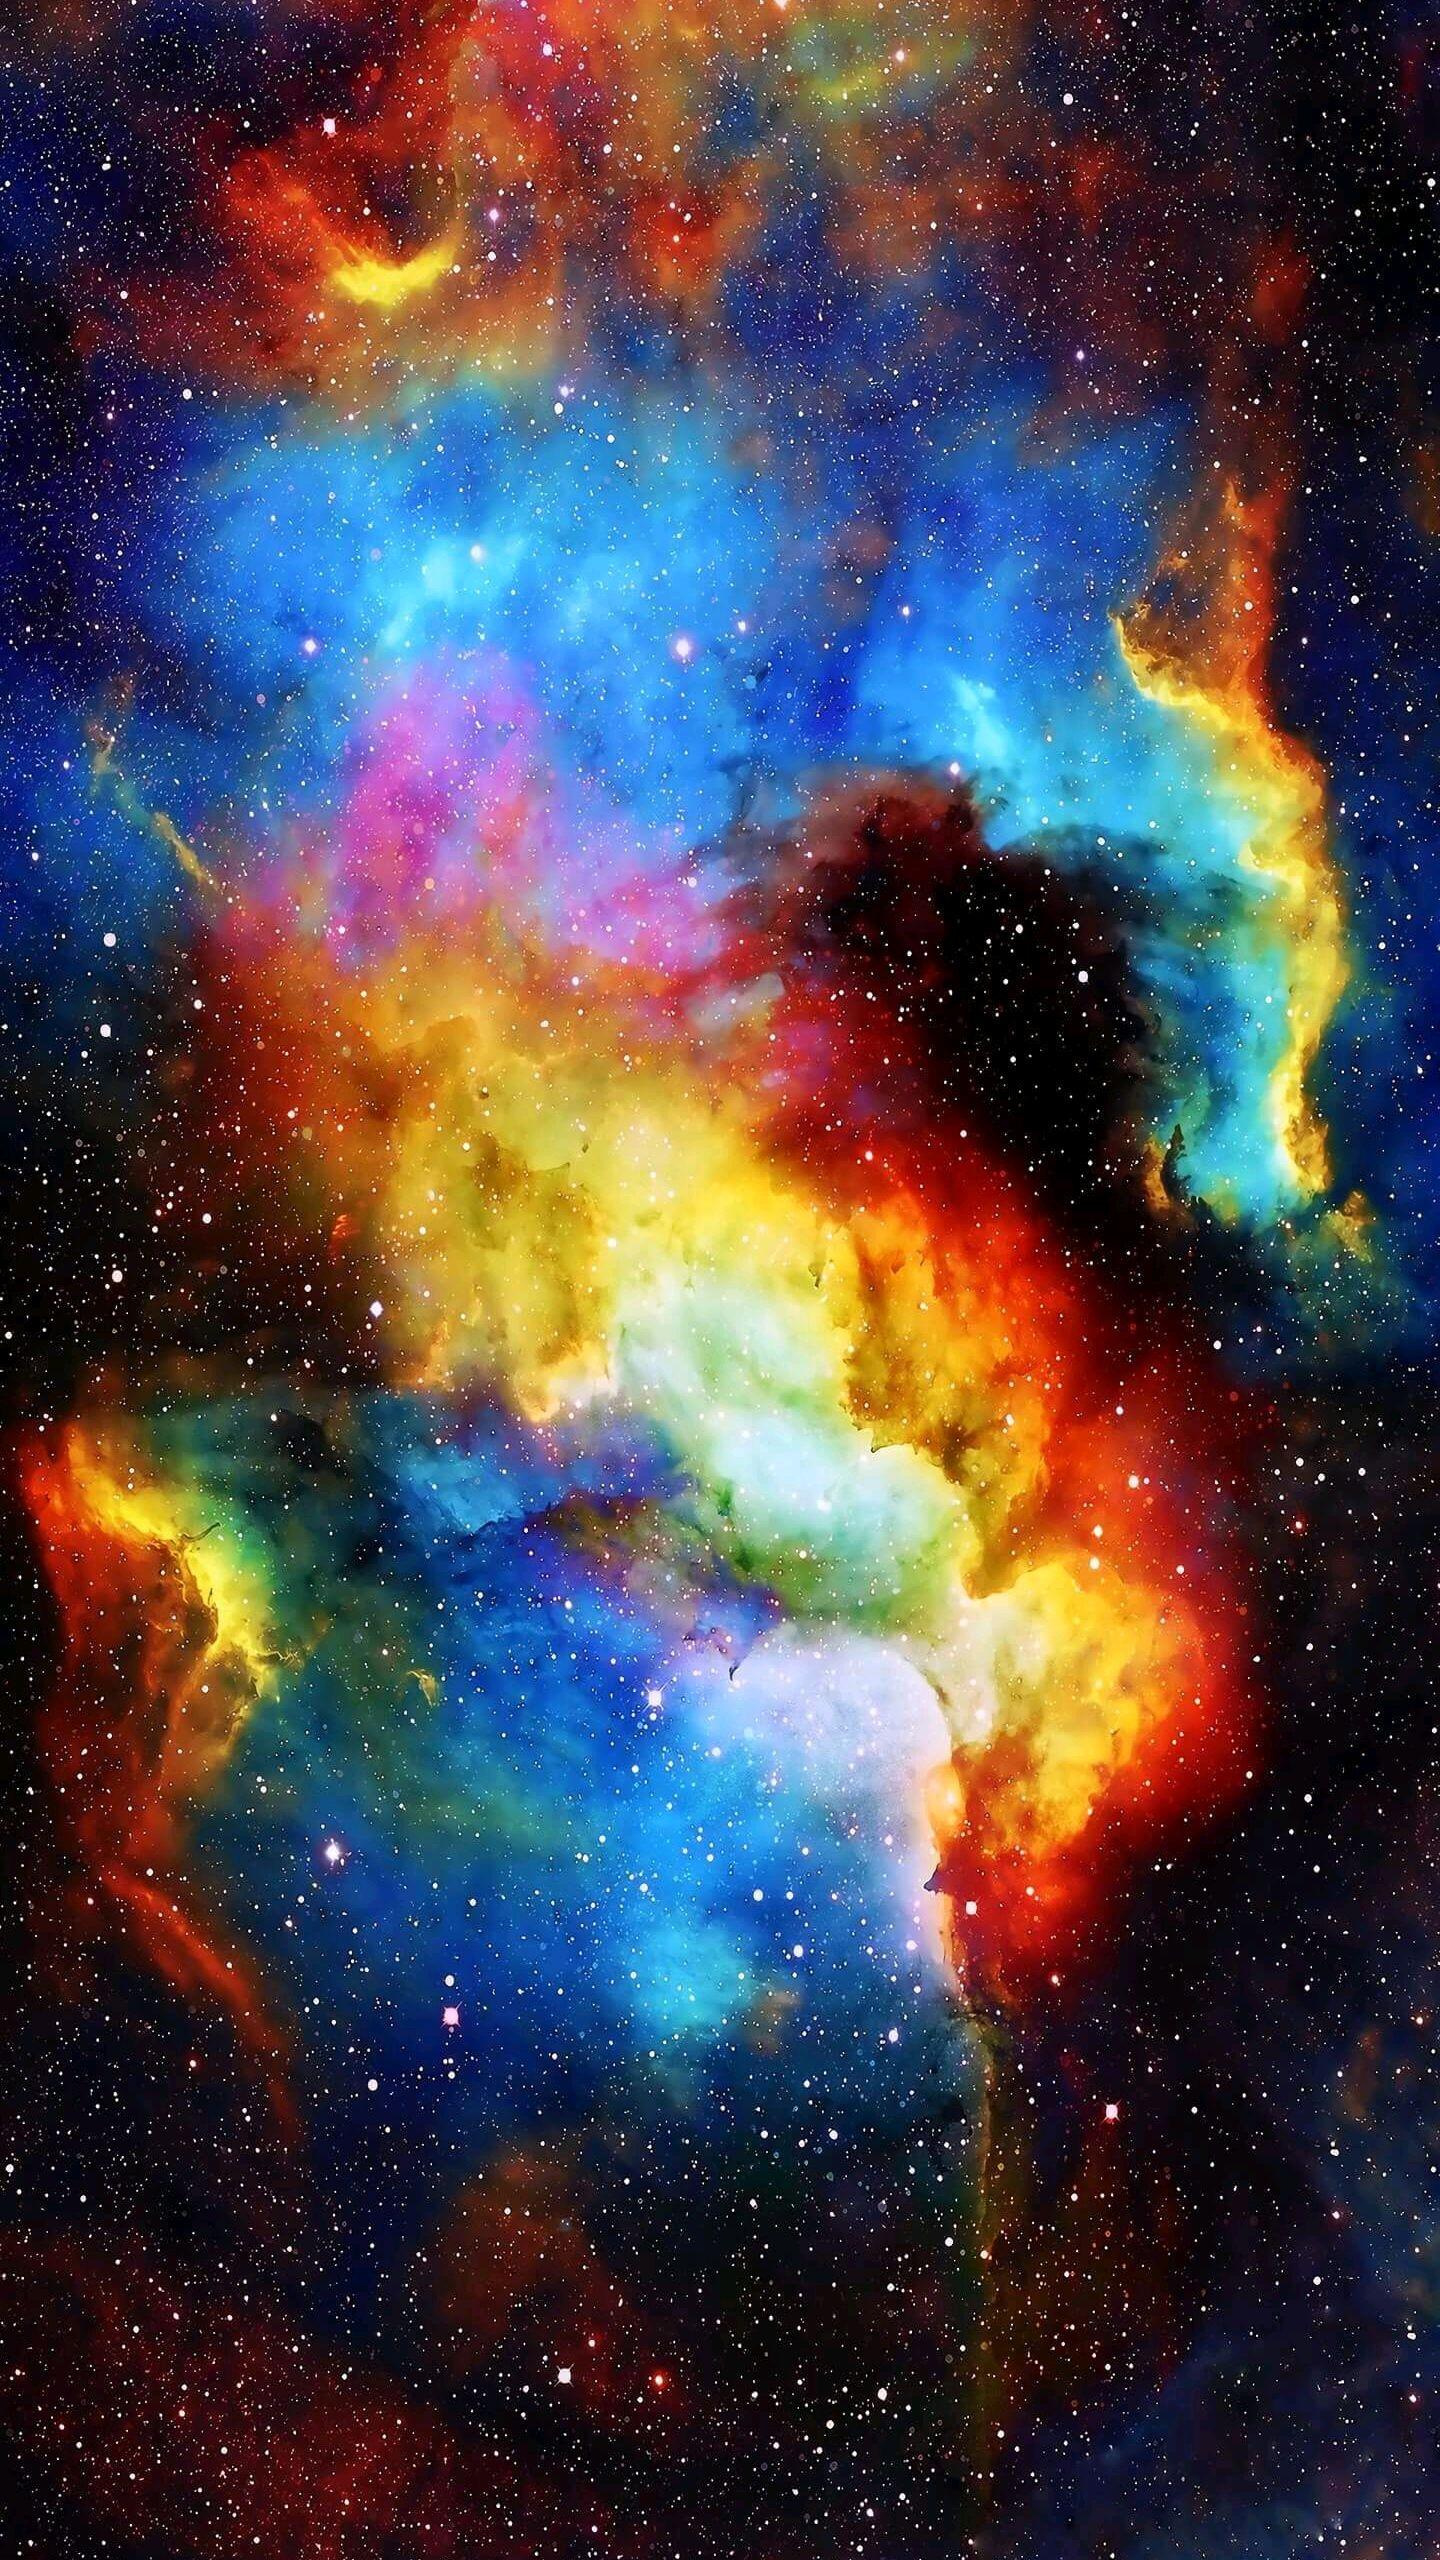 Colorful galaxy nebula space iphone wallpaper - Colorful galaxy wallpaper ...